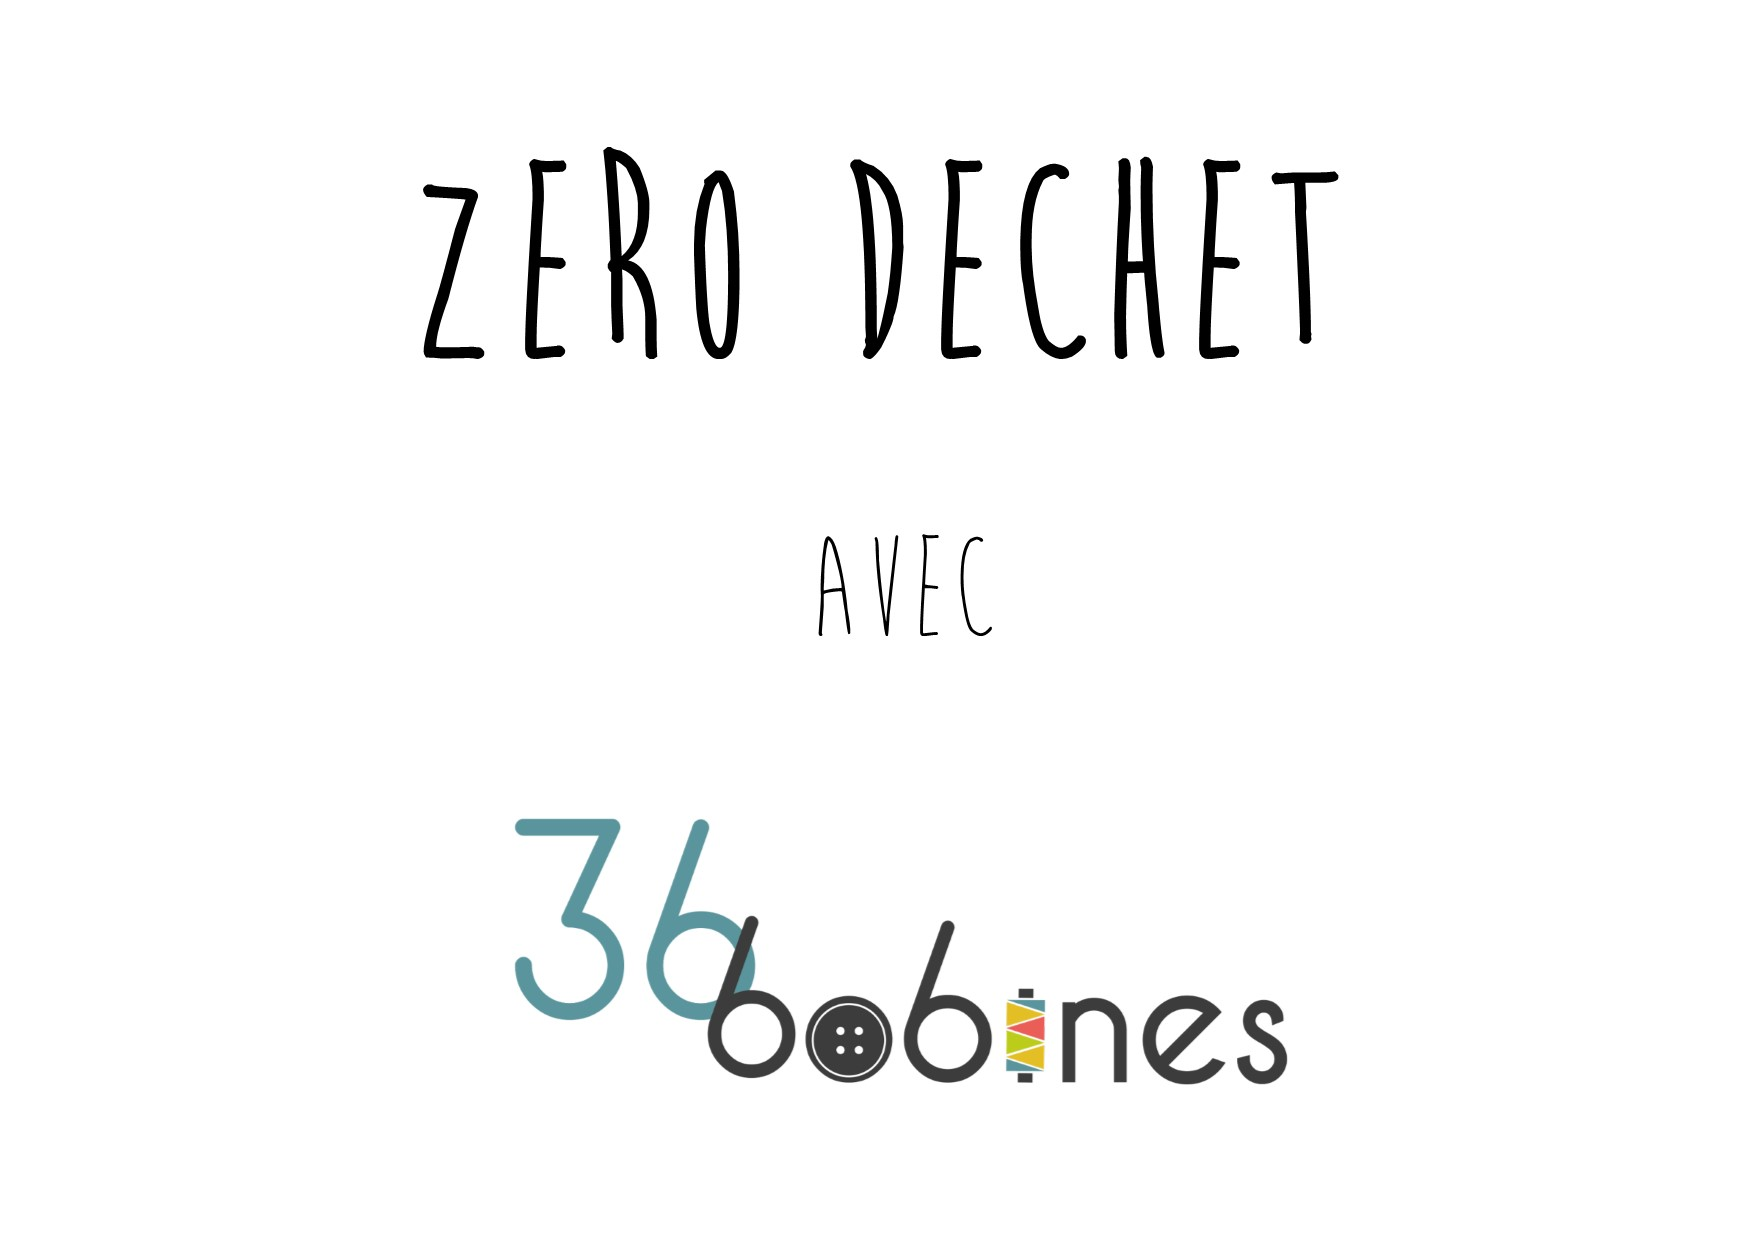 zero-dechet-36-bobines